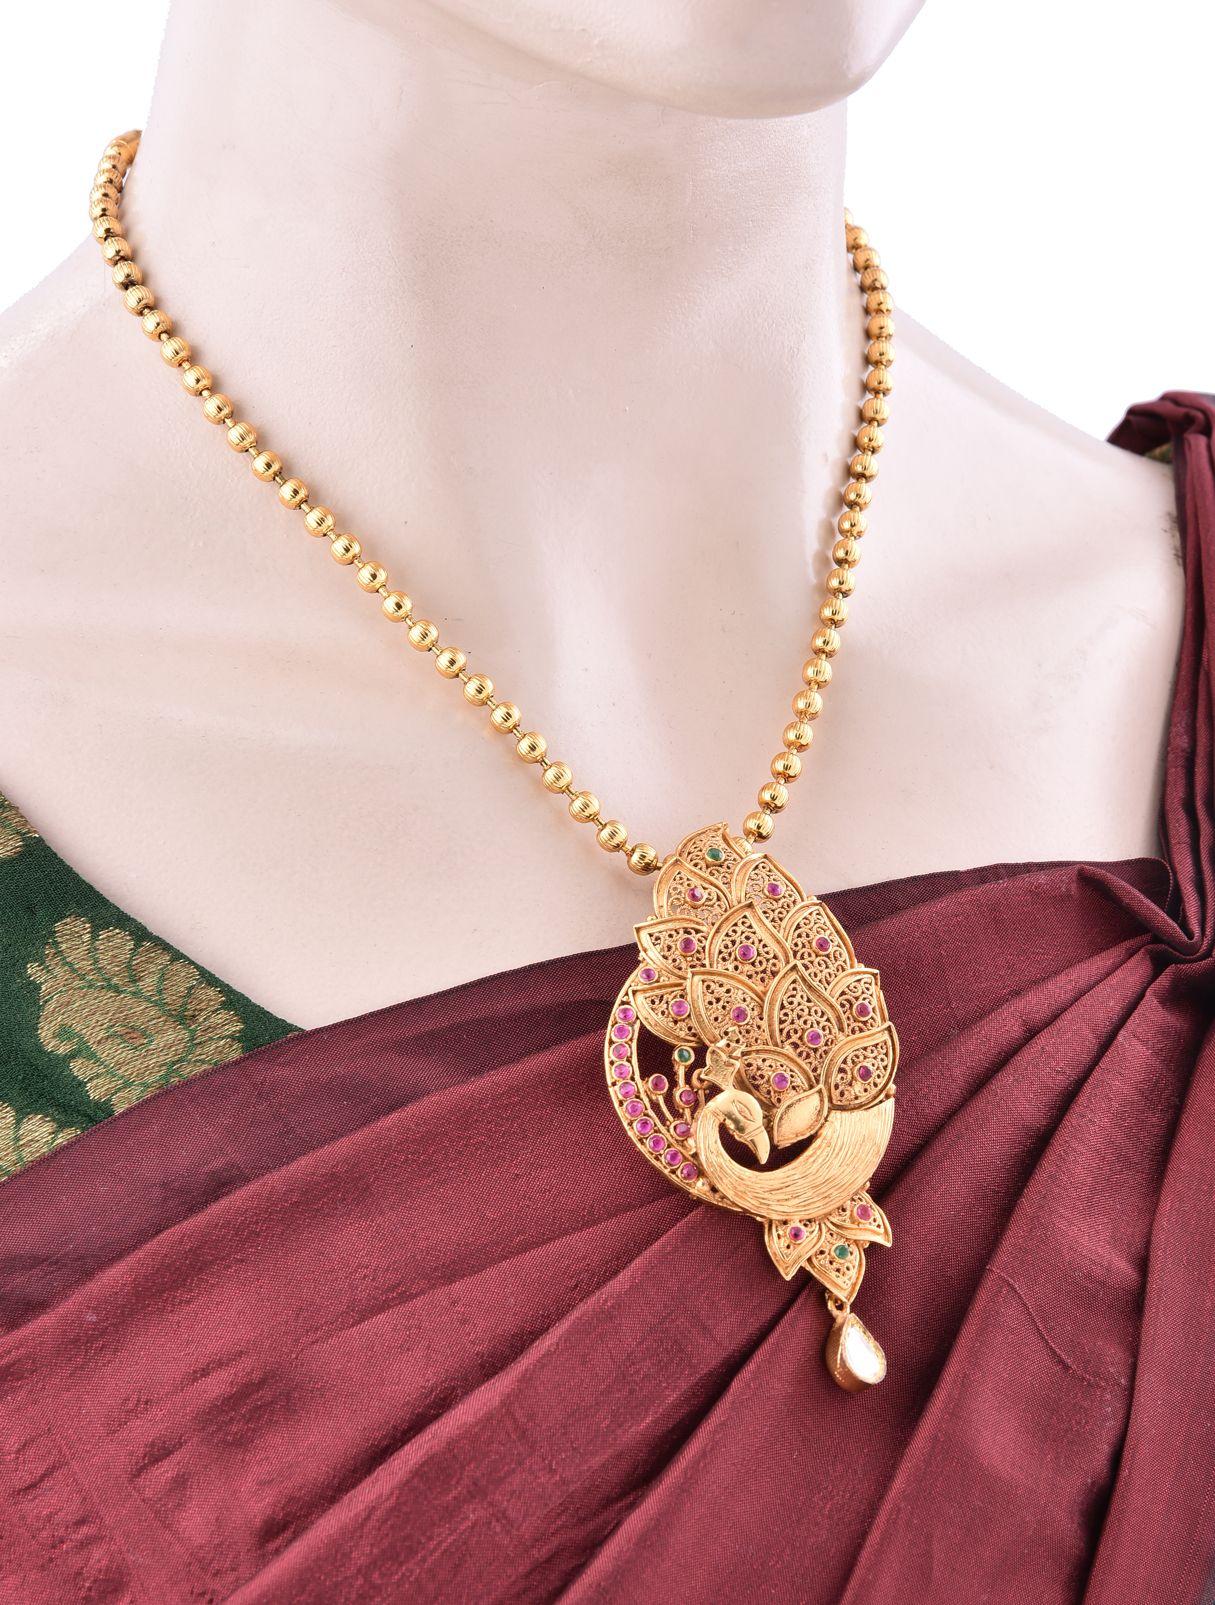 Peacock designer pendant necklace s pinterest peacocks peacock designer pendant necklace mozeypictures Gallery